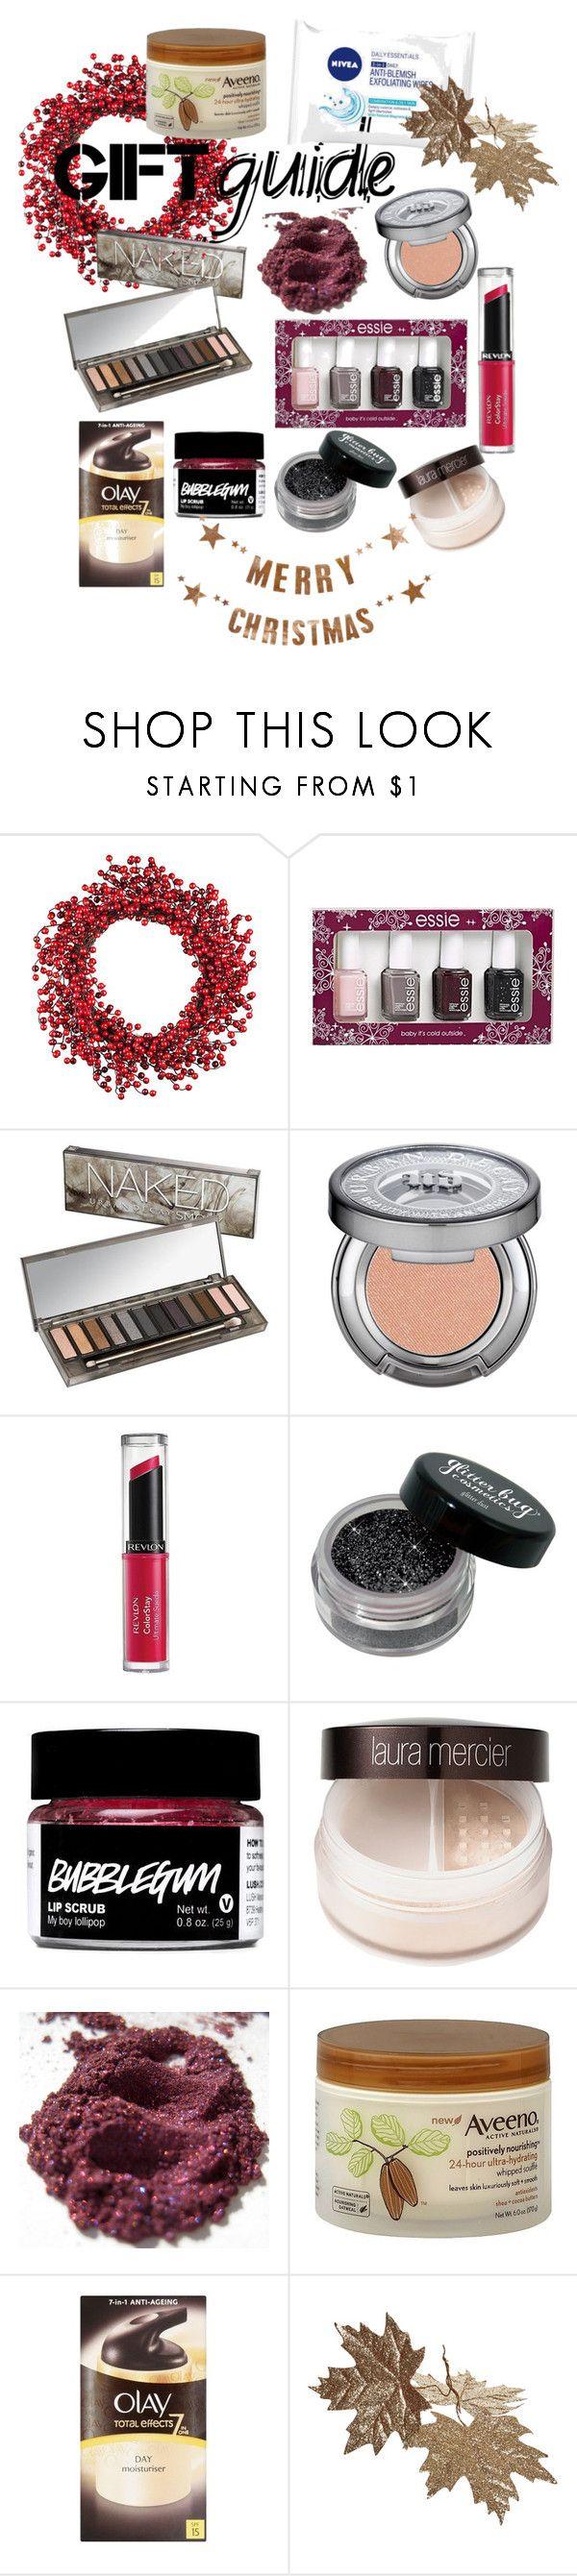 """Beauty"" by jessicamlrw ❤ liked on Polyvore featuring beauty, Improvements, Essie, Urban Decay, Revlon, Nivea, Laura Mercier, Aveeno, Olay and Bloomingville"